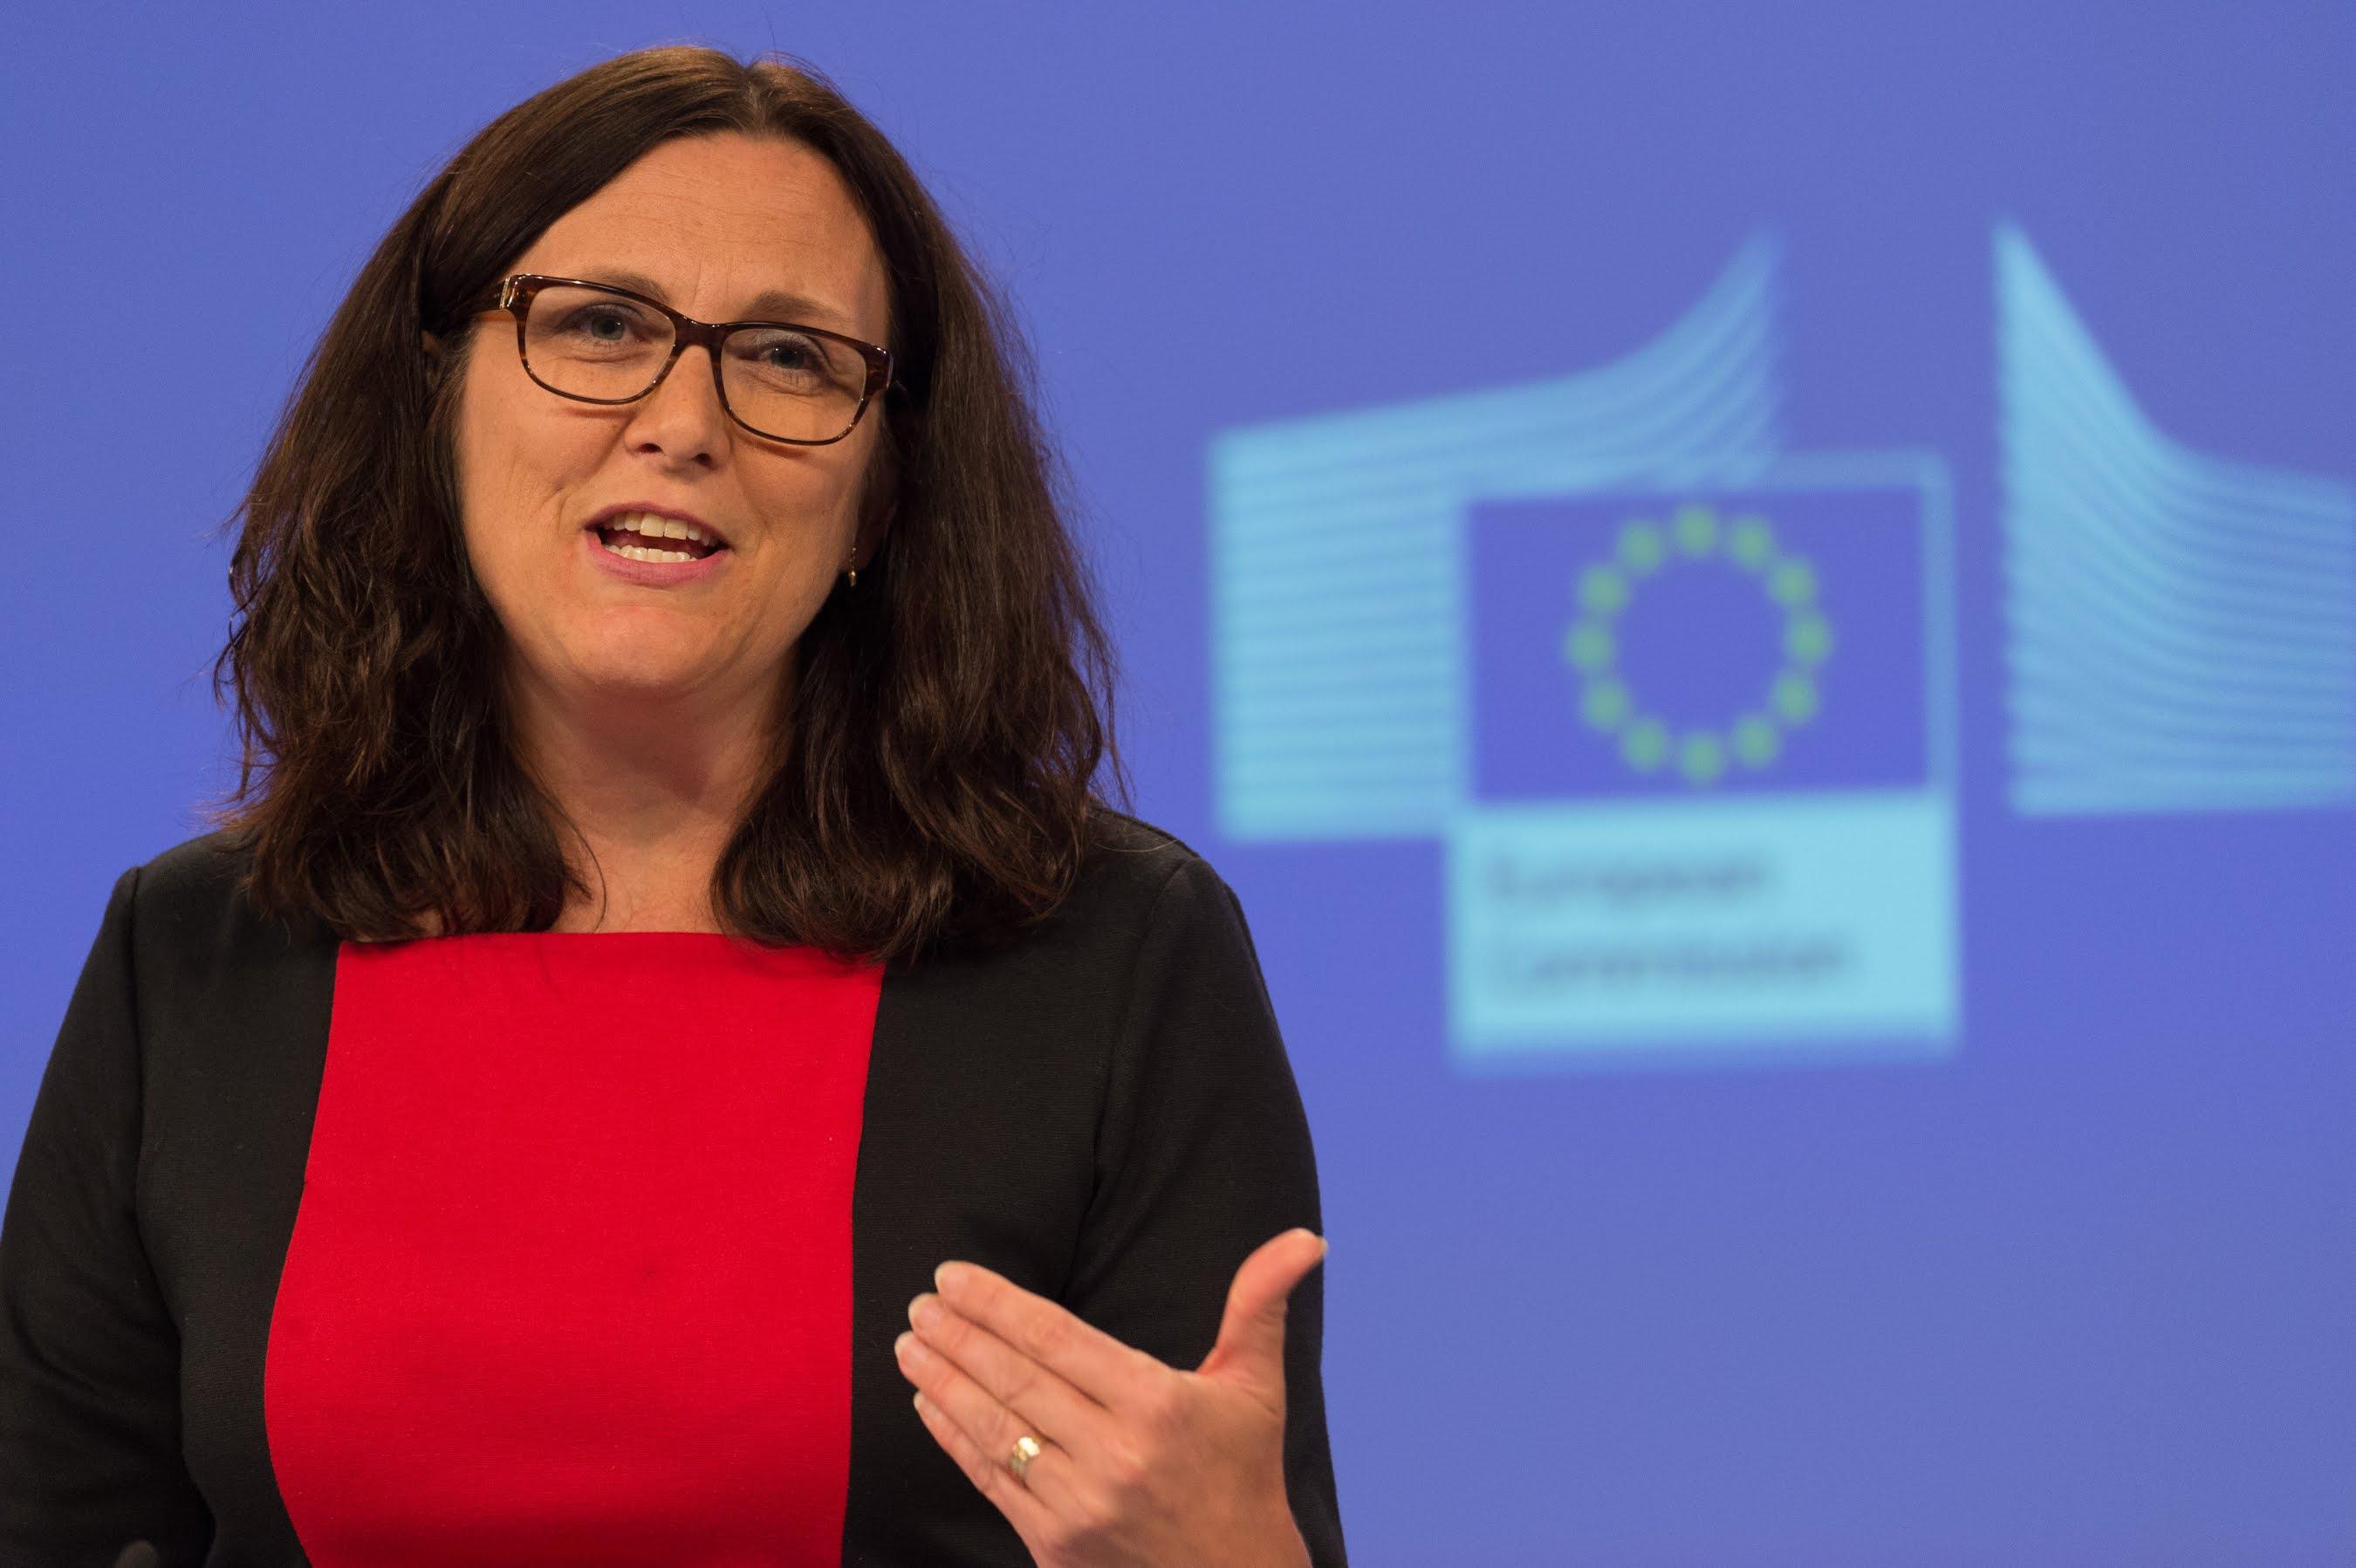 Cecilia Malmstroem - © European Union, 2015 / Source: EC - Audiovisual Service / Photo: Georges Boulougouris